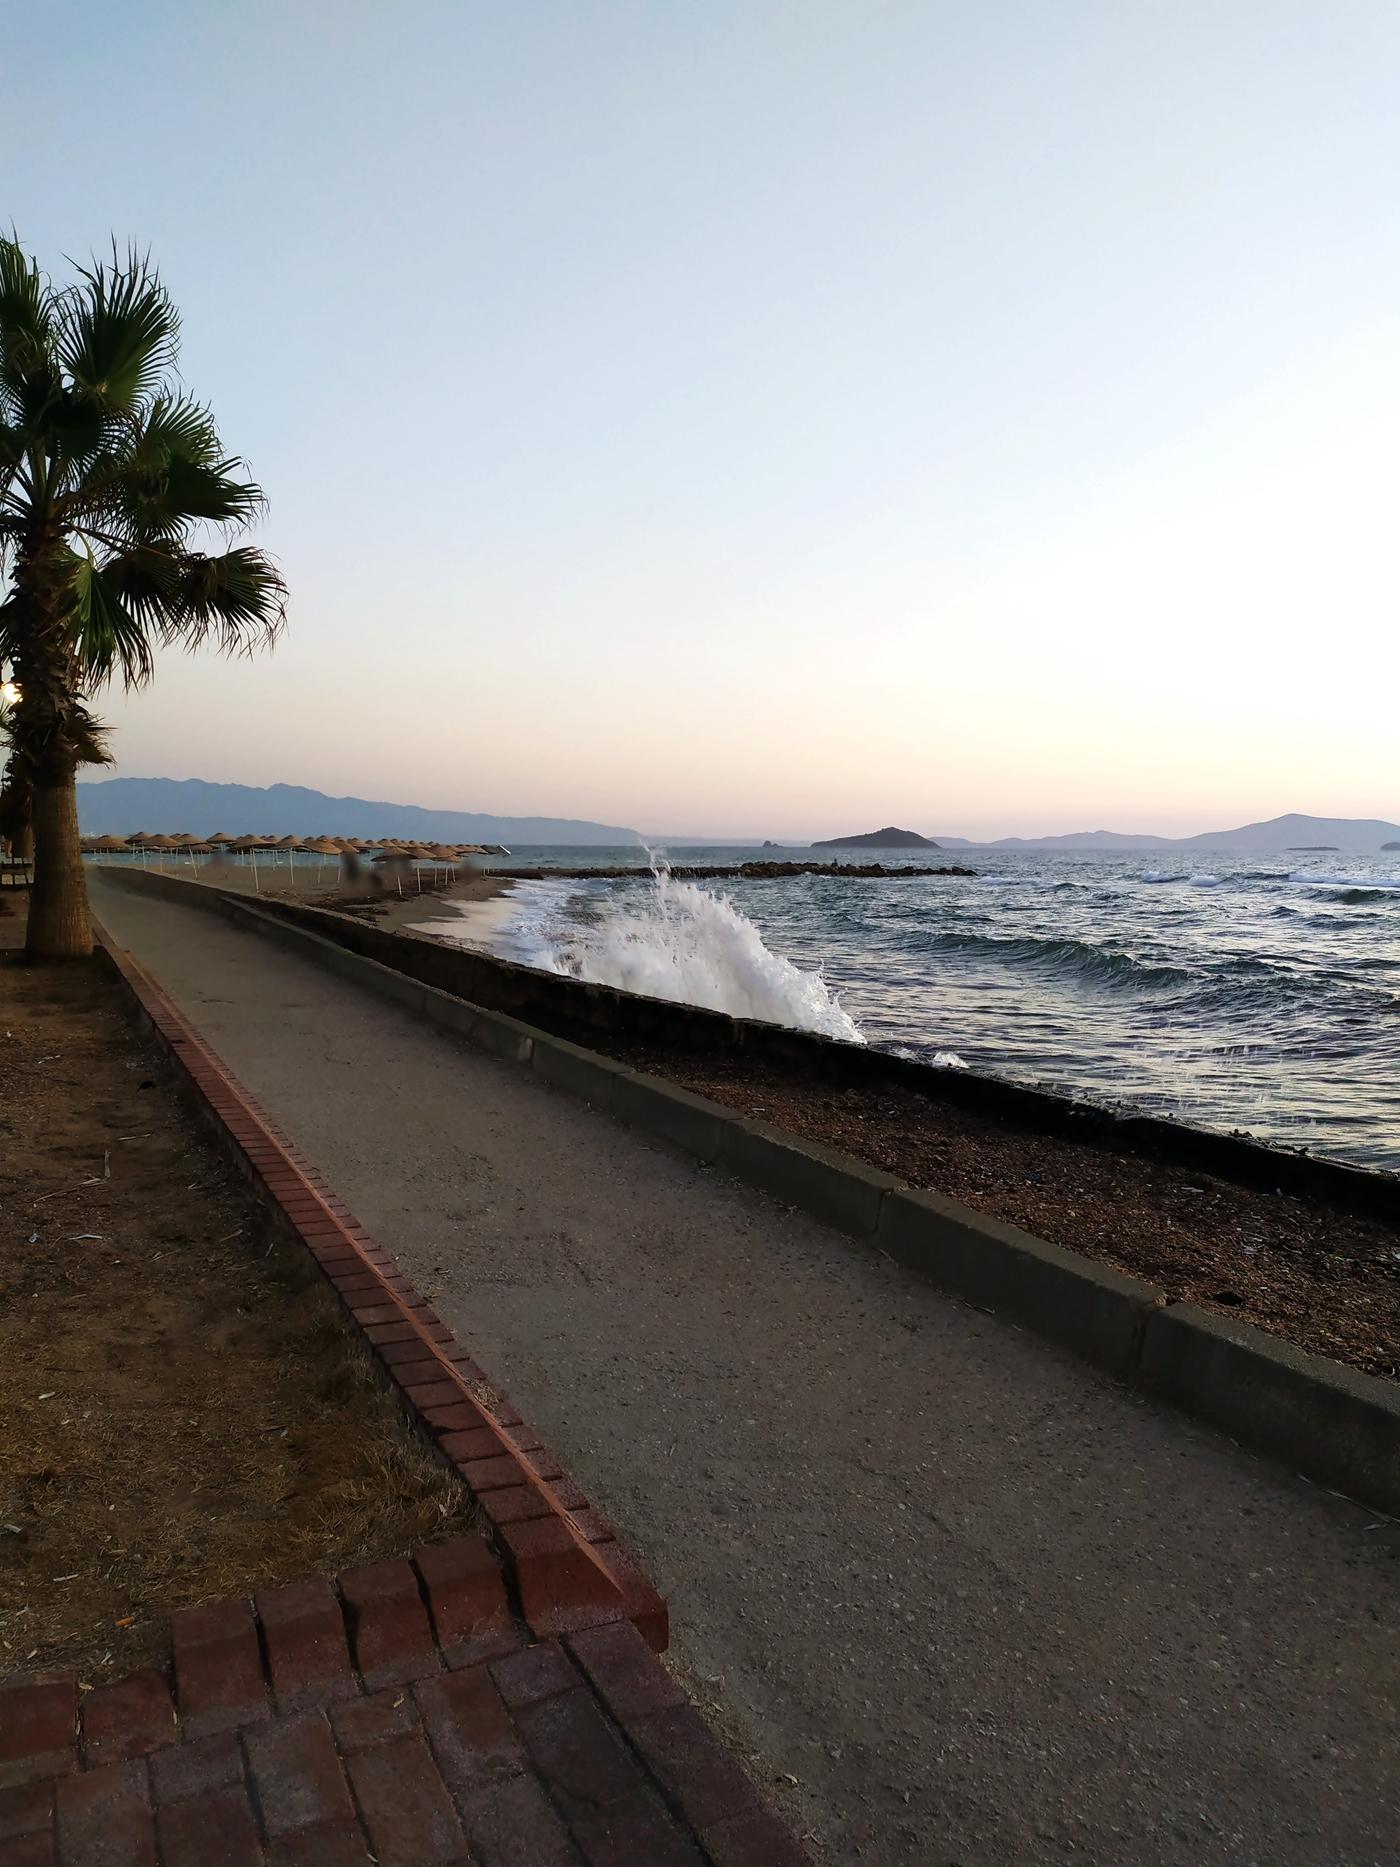 Palm Tree and Great Sea View on the Coastal Walkway